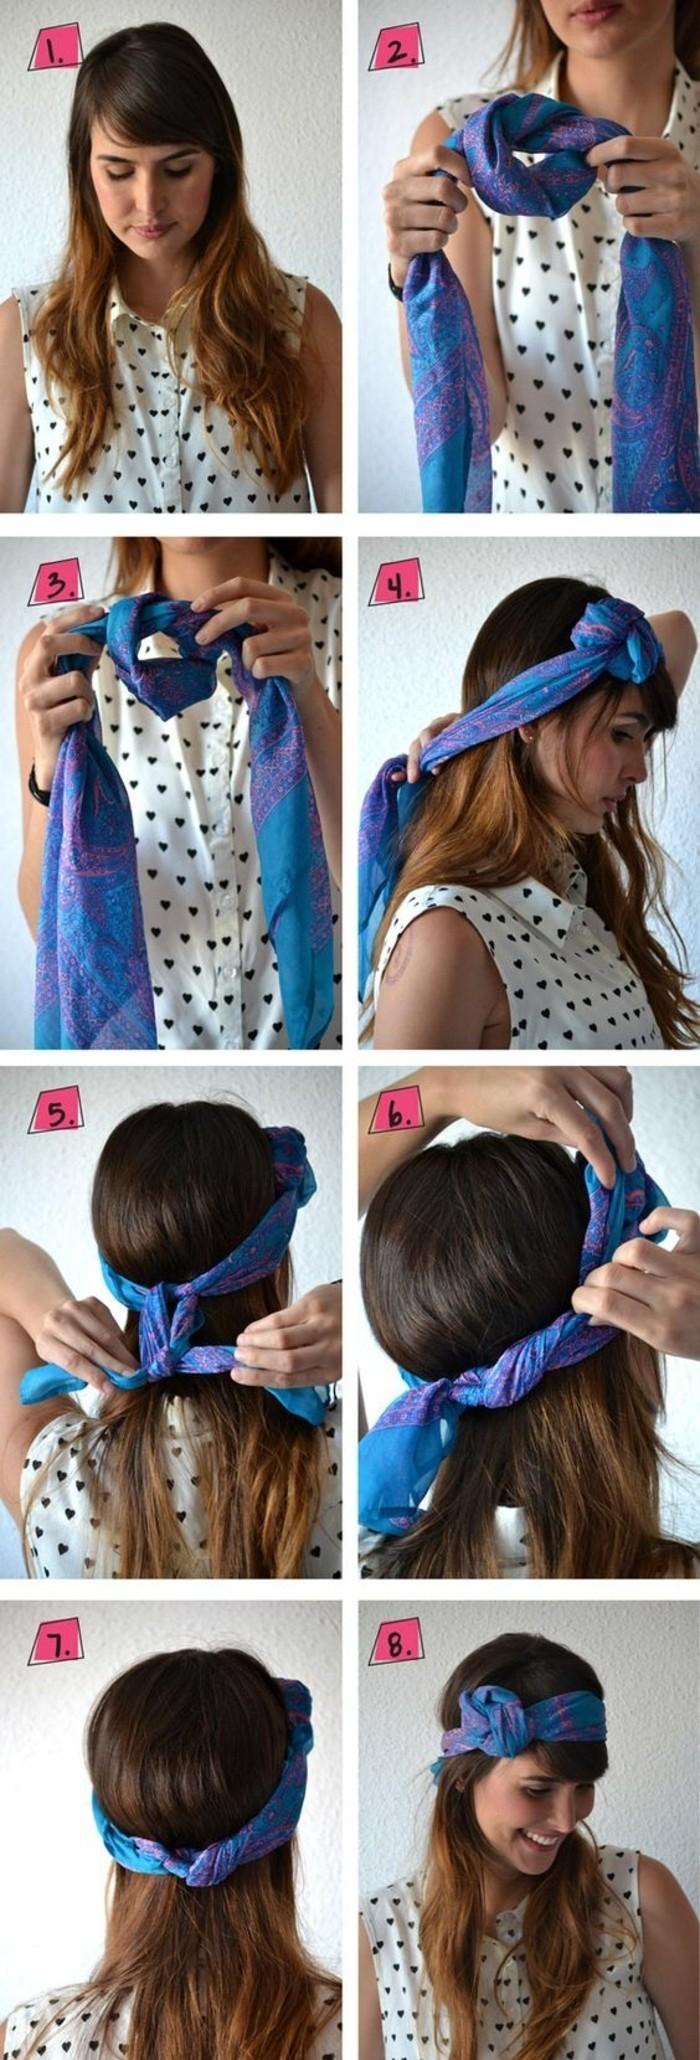 Foulard long pour cheveux